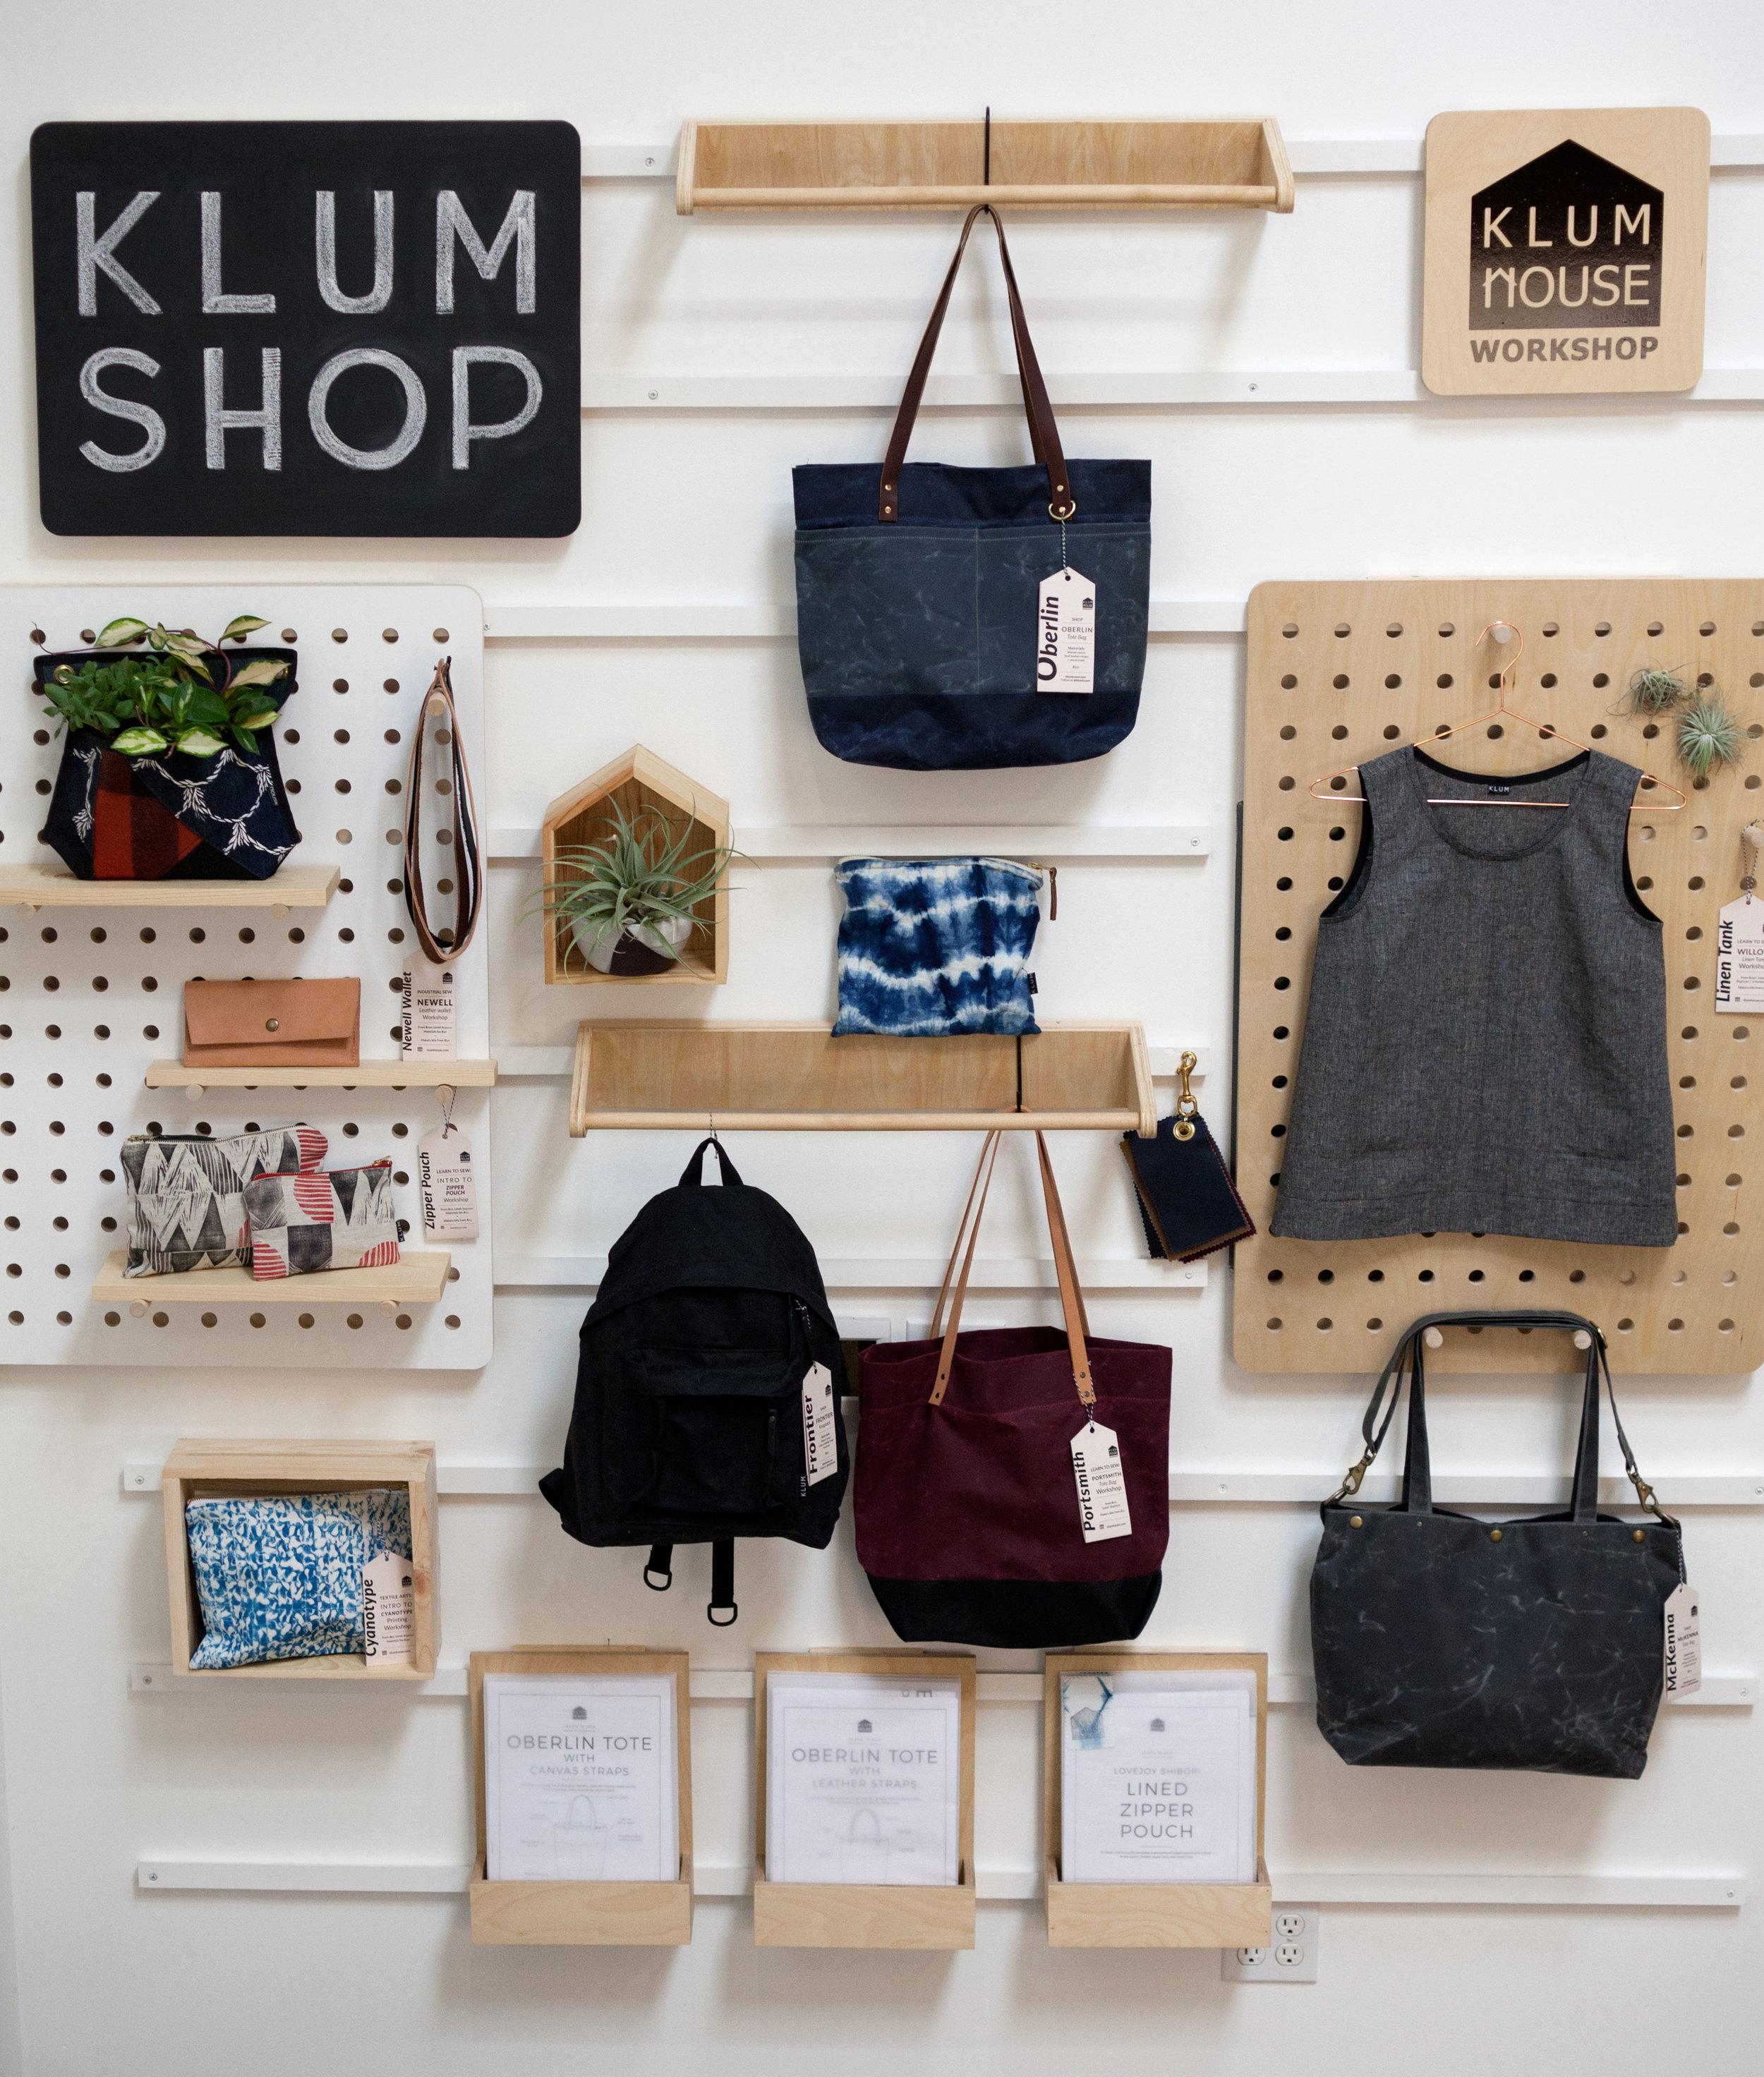 Klum House Display Wall